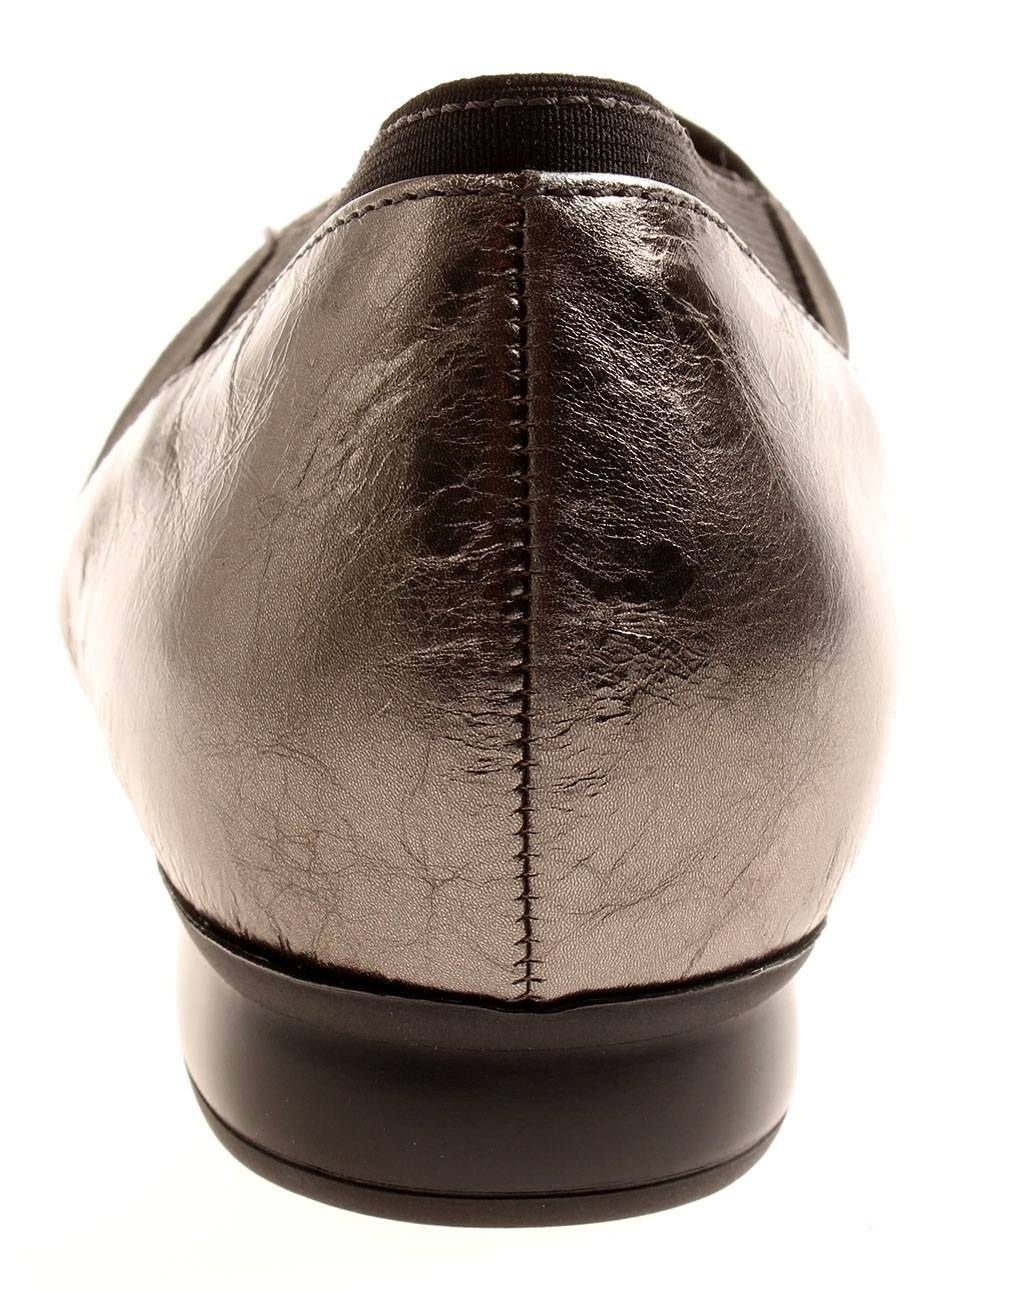 Theresia Schuhe M. Damenschuhe Slipper Leder Schuhe Theresia Einlagen Halbschuhe 55406 33e256